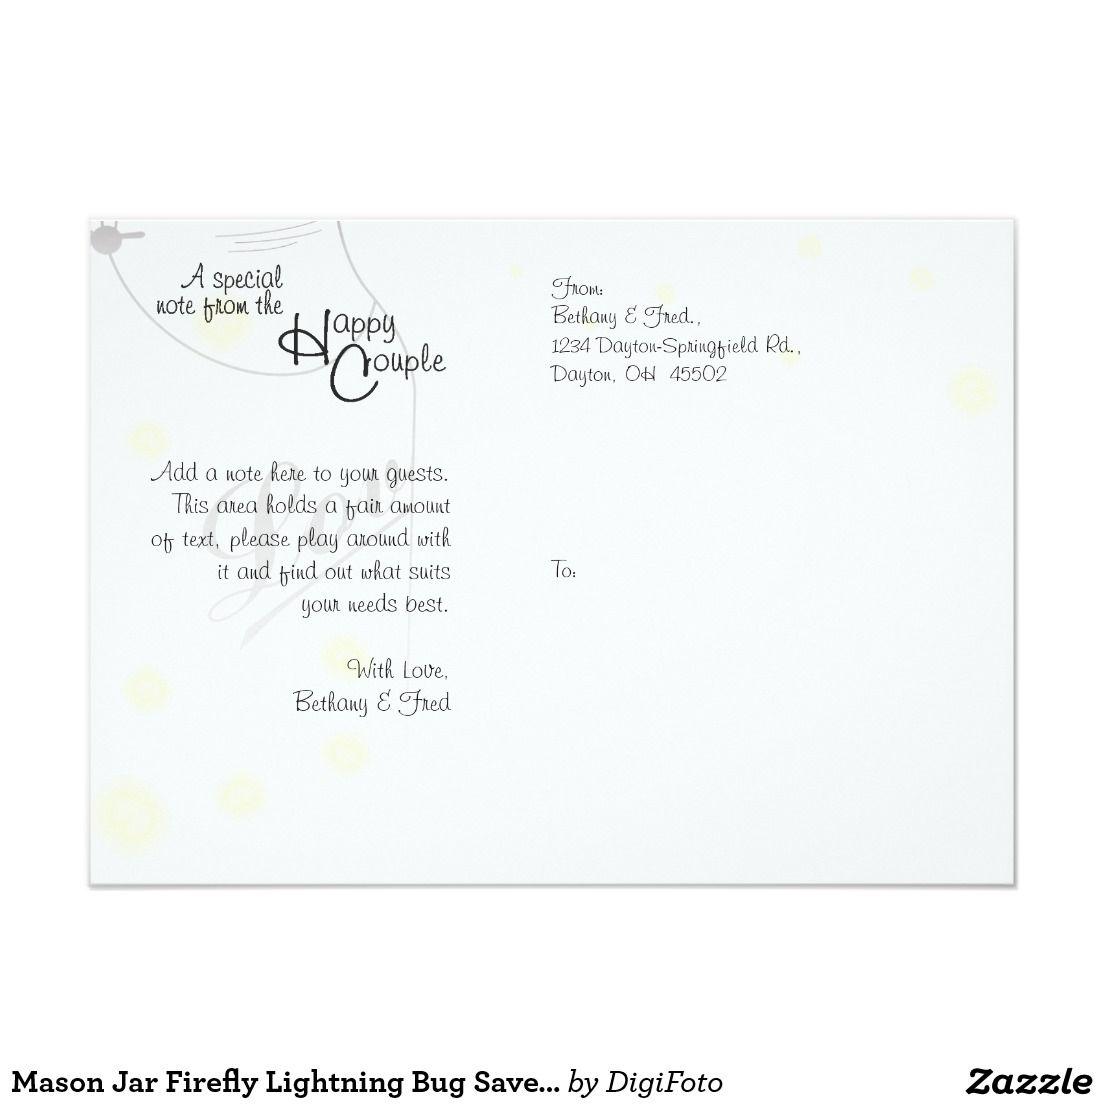 Mason Jar Firefly Lightning Bug Save The Date Card | Weddings